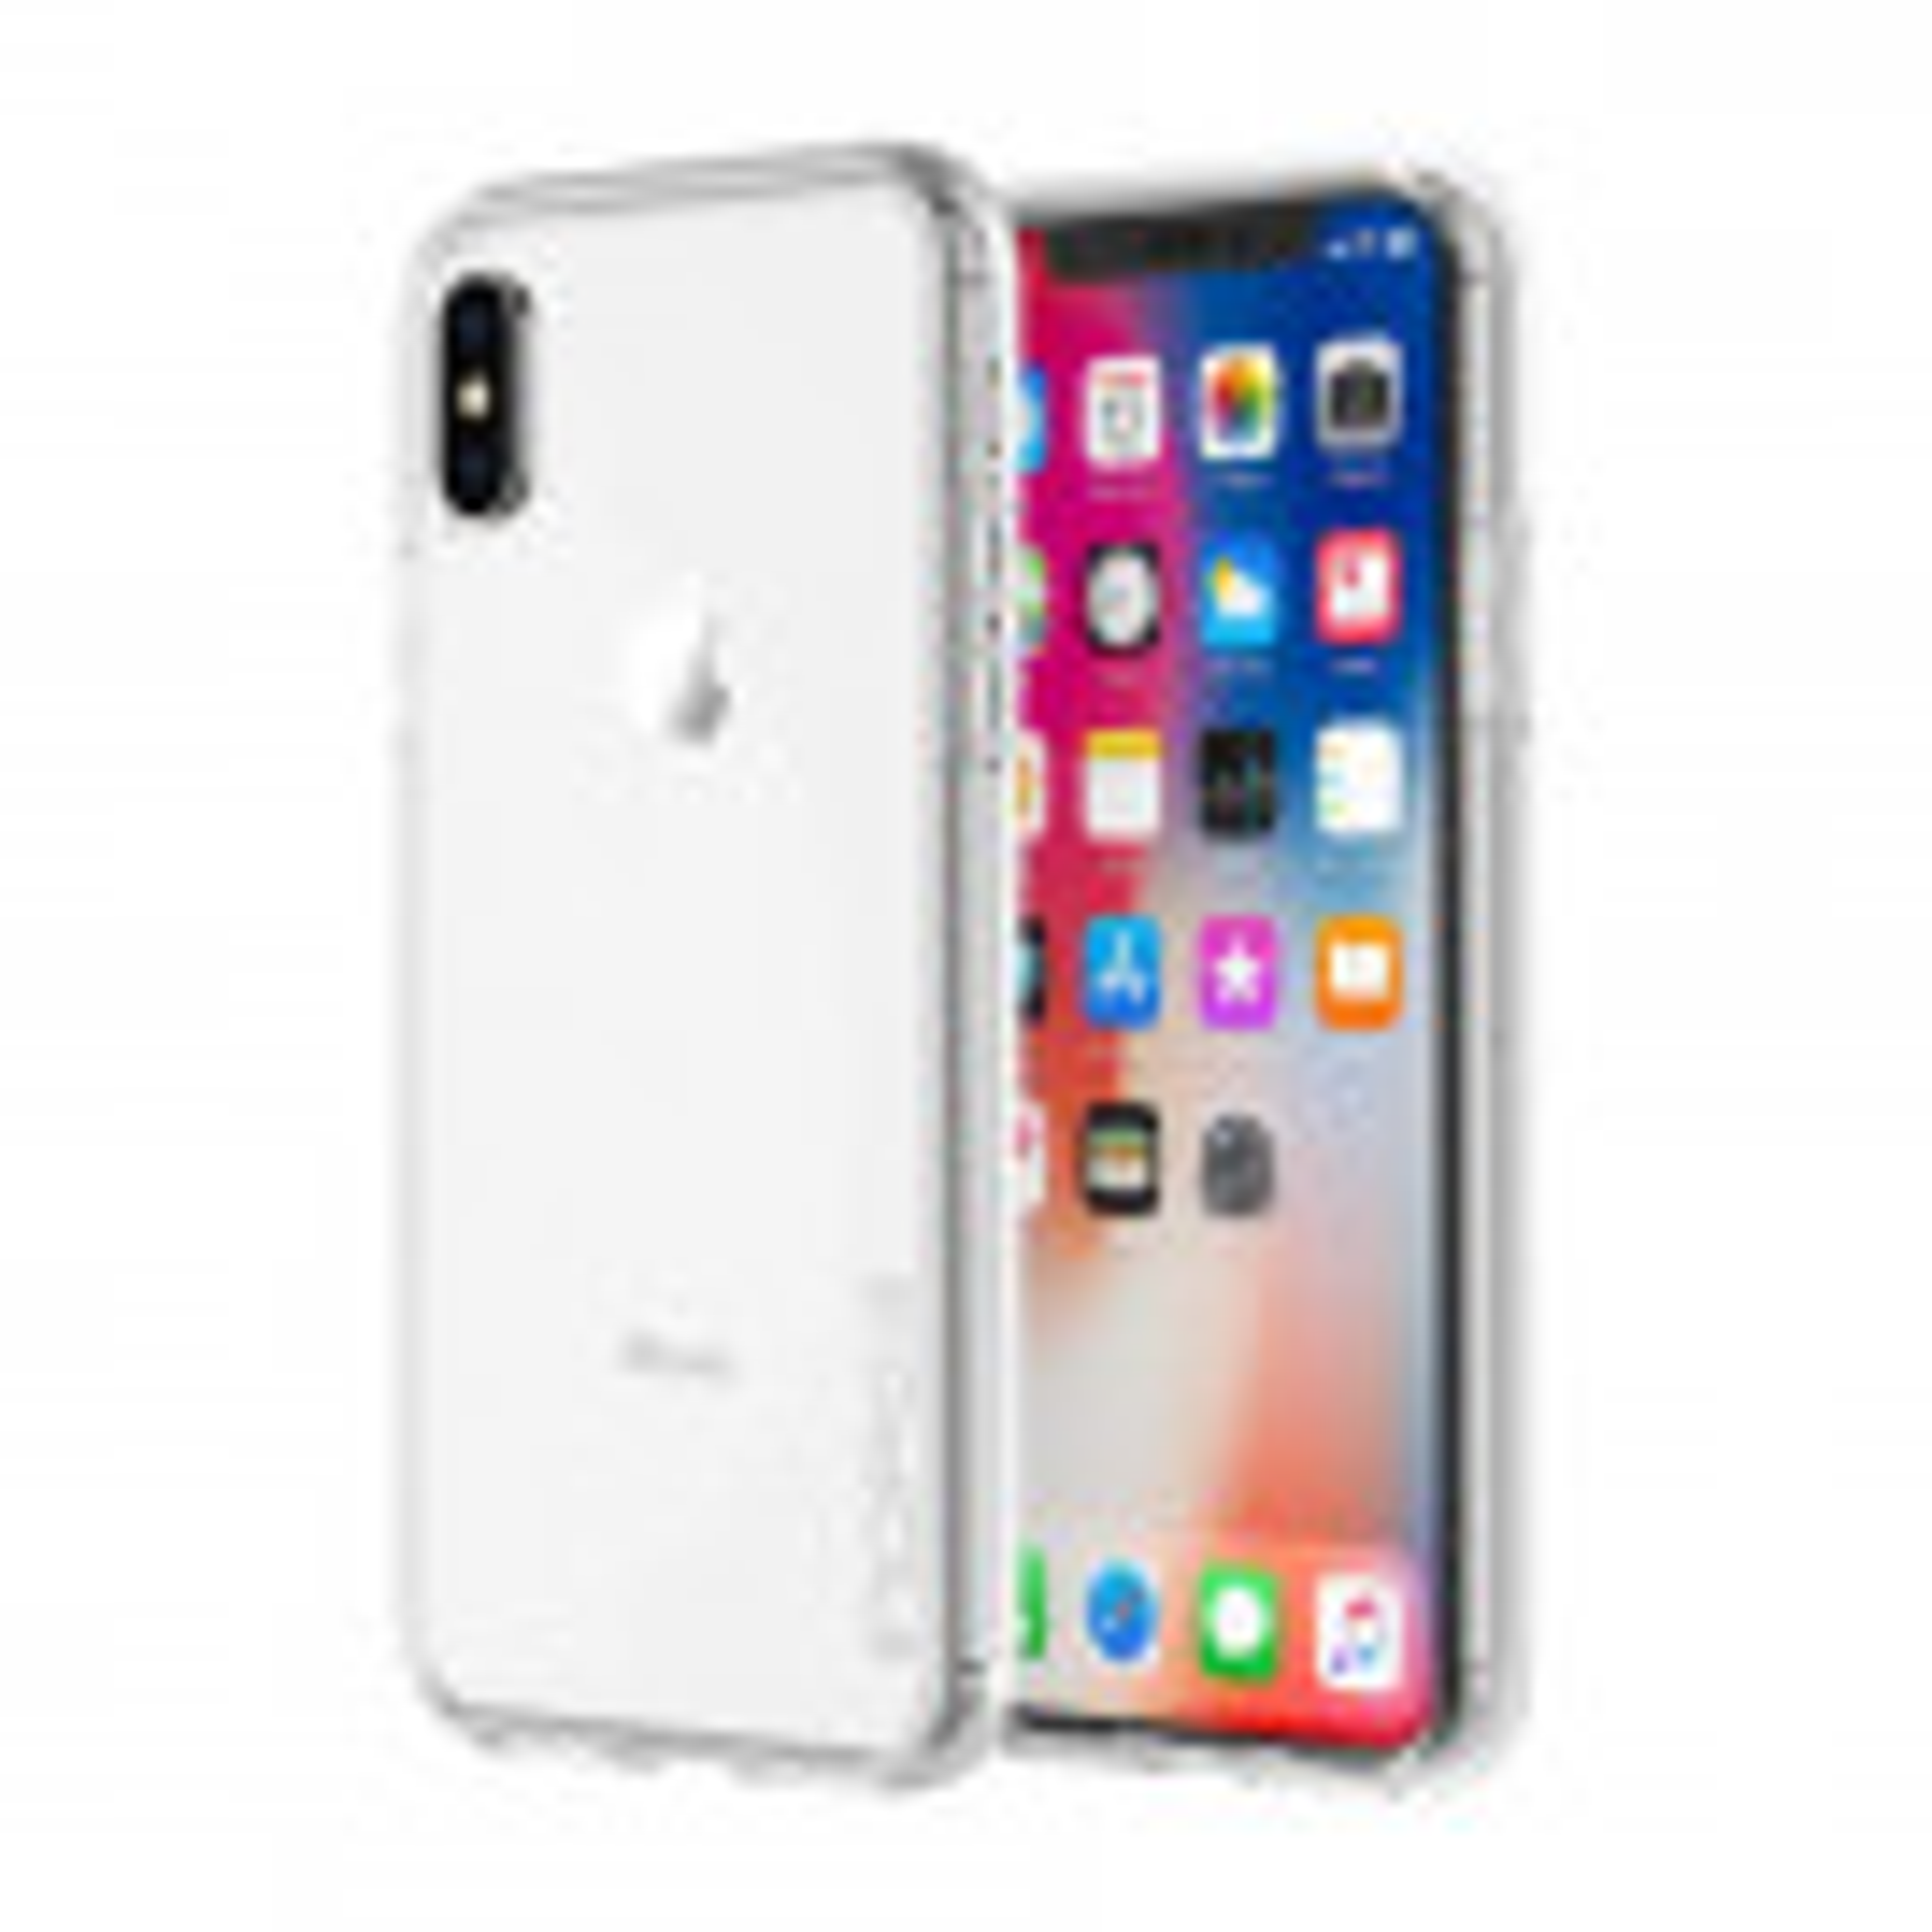 Incipio Octane Beskyttelsescover til Apple iPhone Xs/X - klar